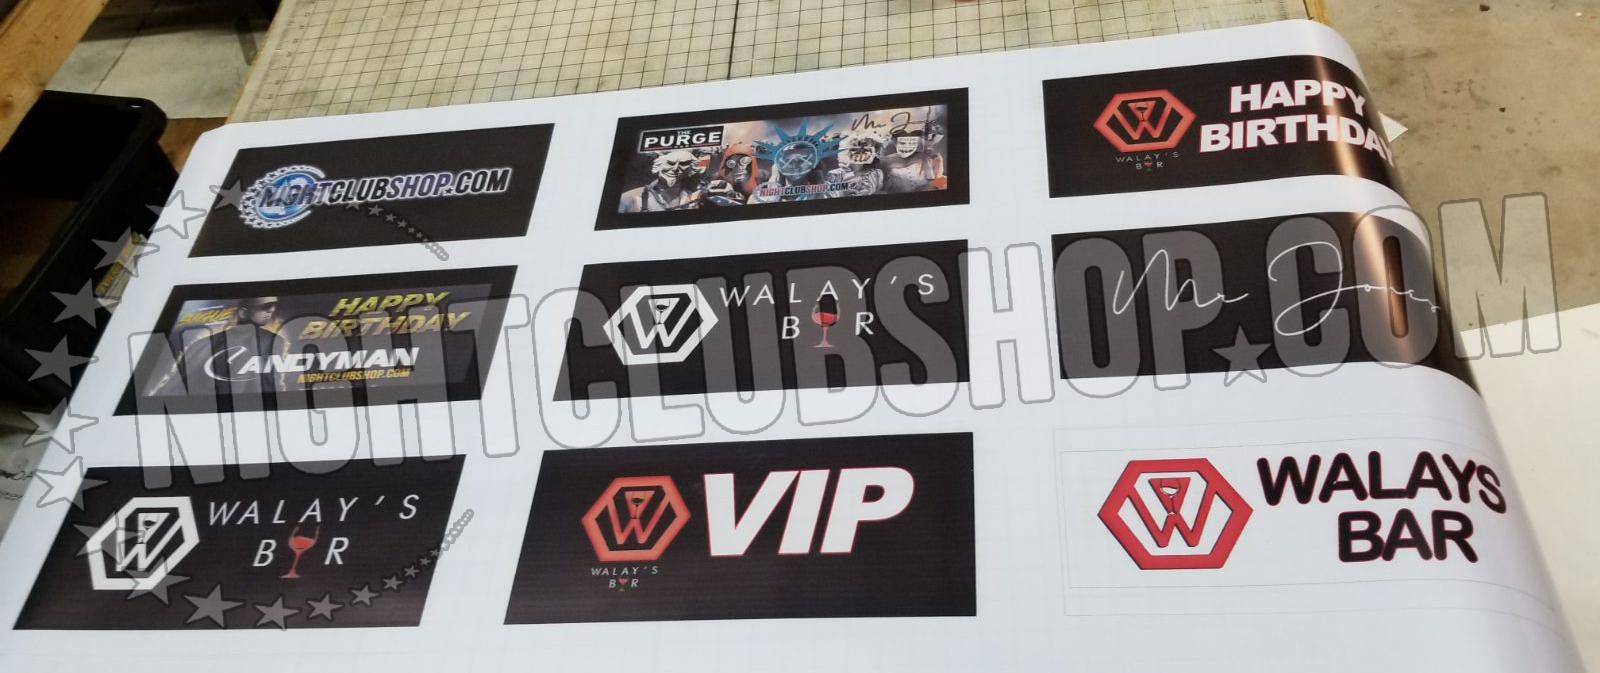 vip-banner-top-interchangeable-tray-lightbox-light-up-print-banner-top-bottle-service-tray-presenter-nightclubshop-4.jpg